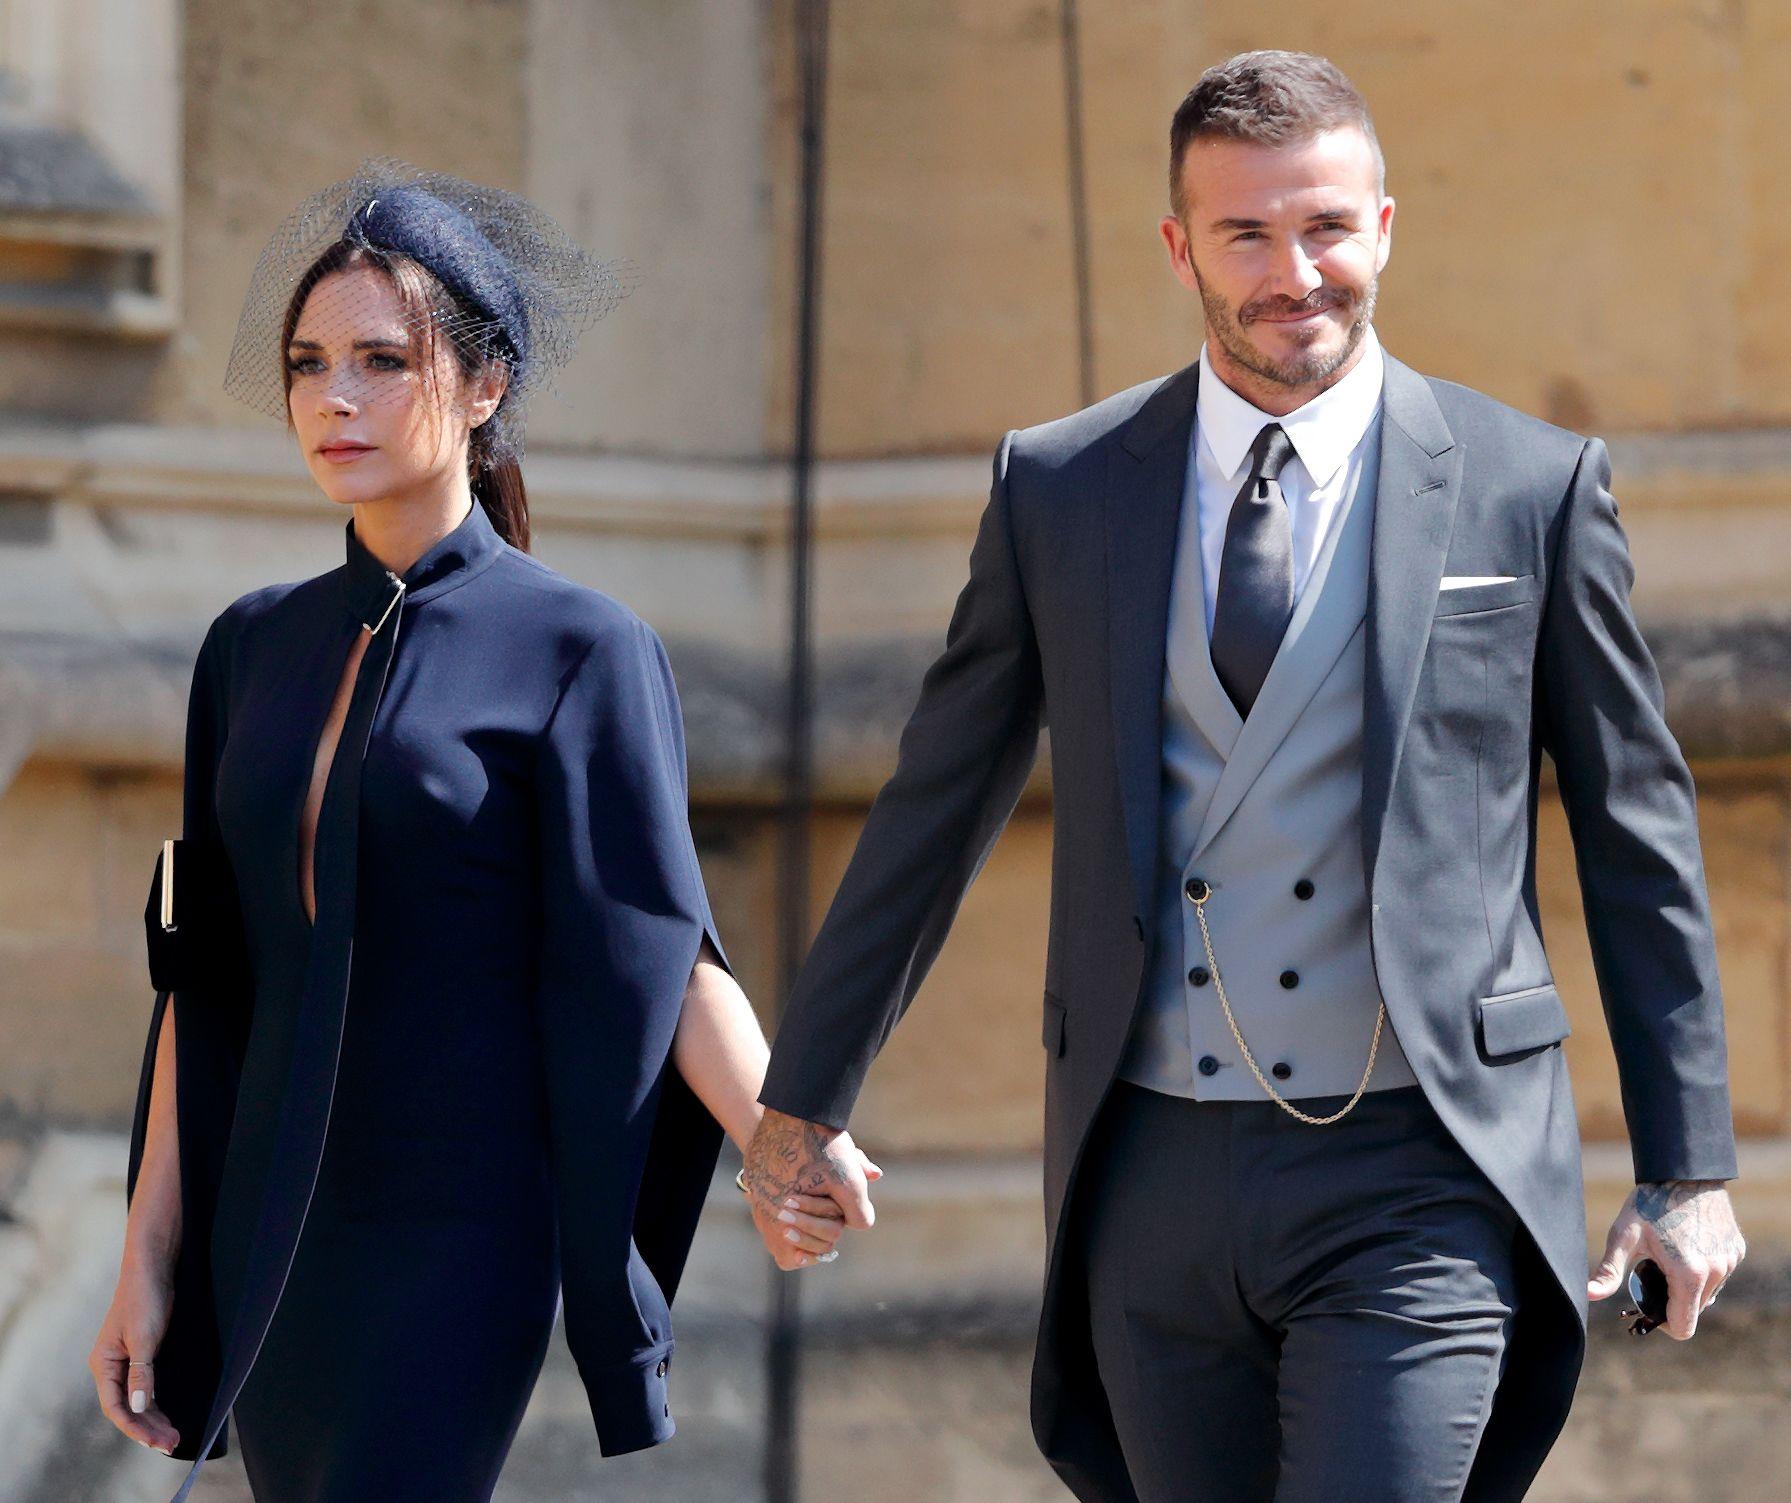 Victoria Beckham Says Royal Wedding Made Her Proud To Be British David Instagram